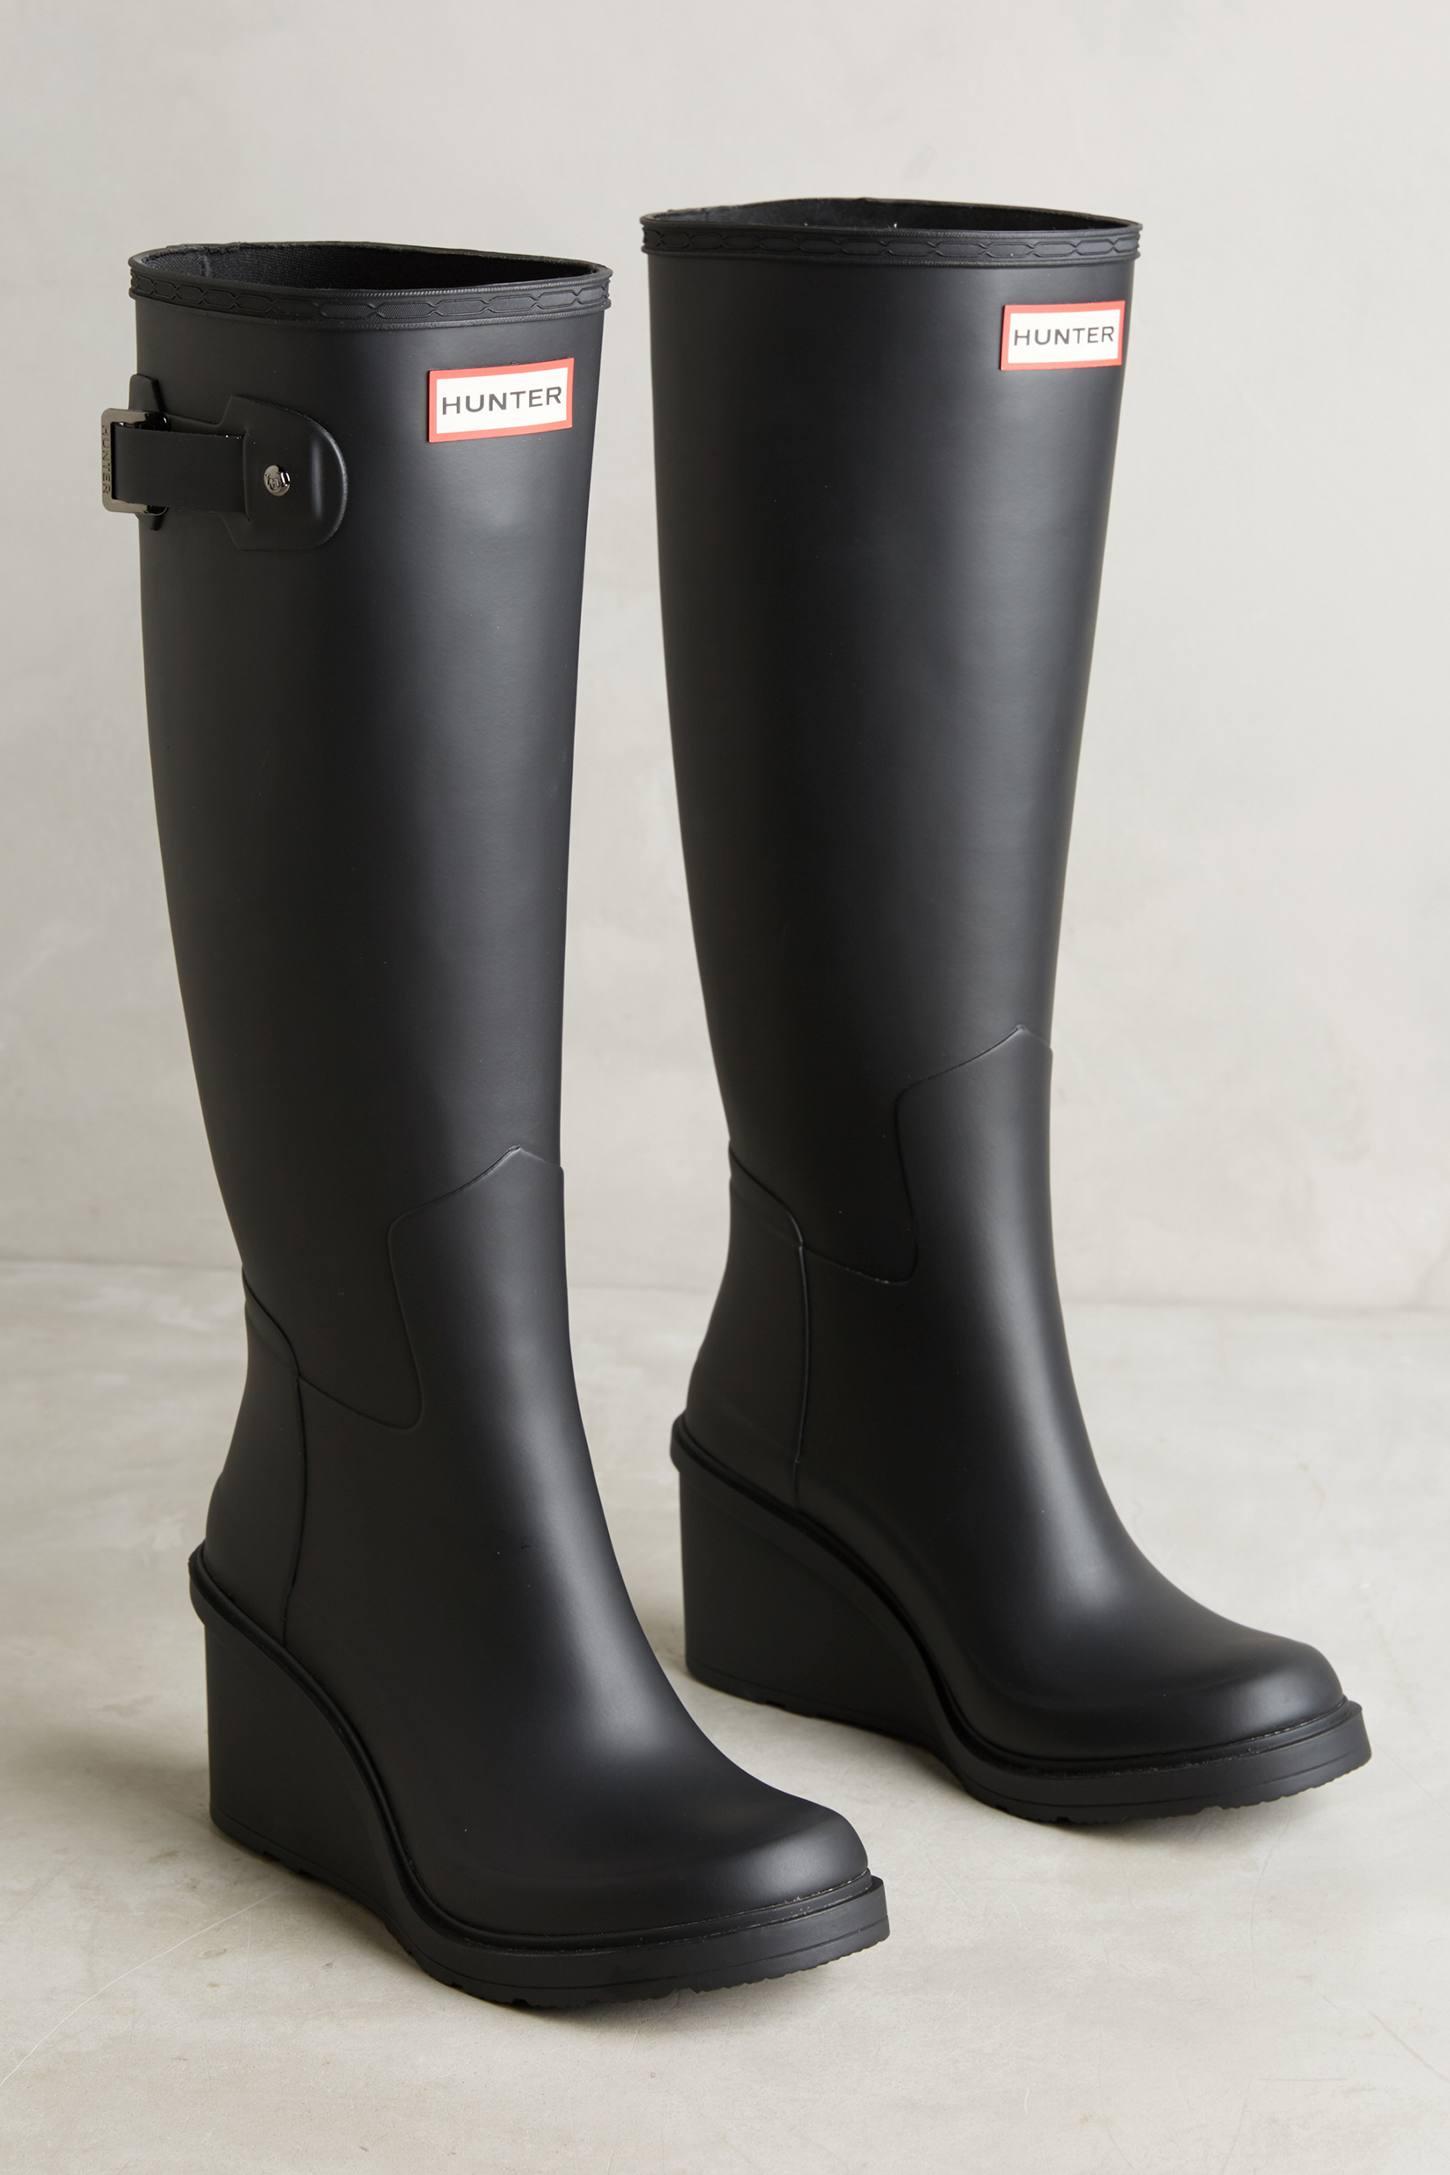 Hunter Tall Wedge Rain Boots   Anthropologie